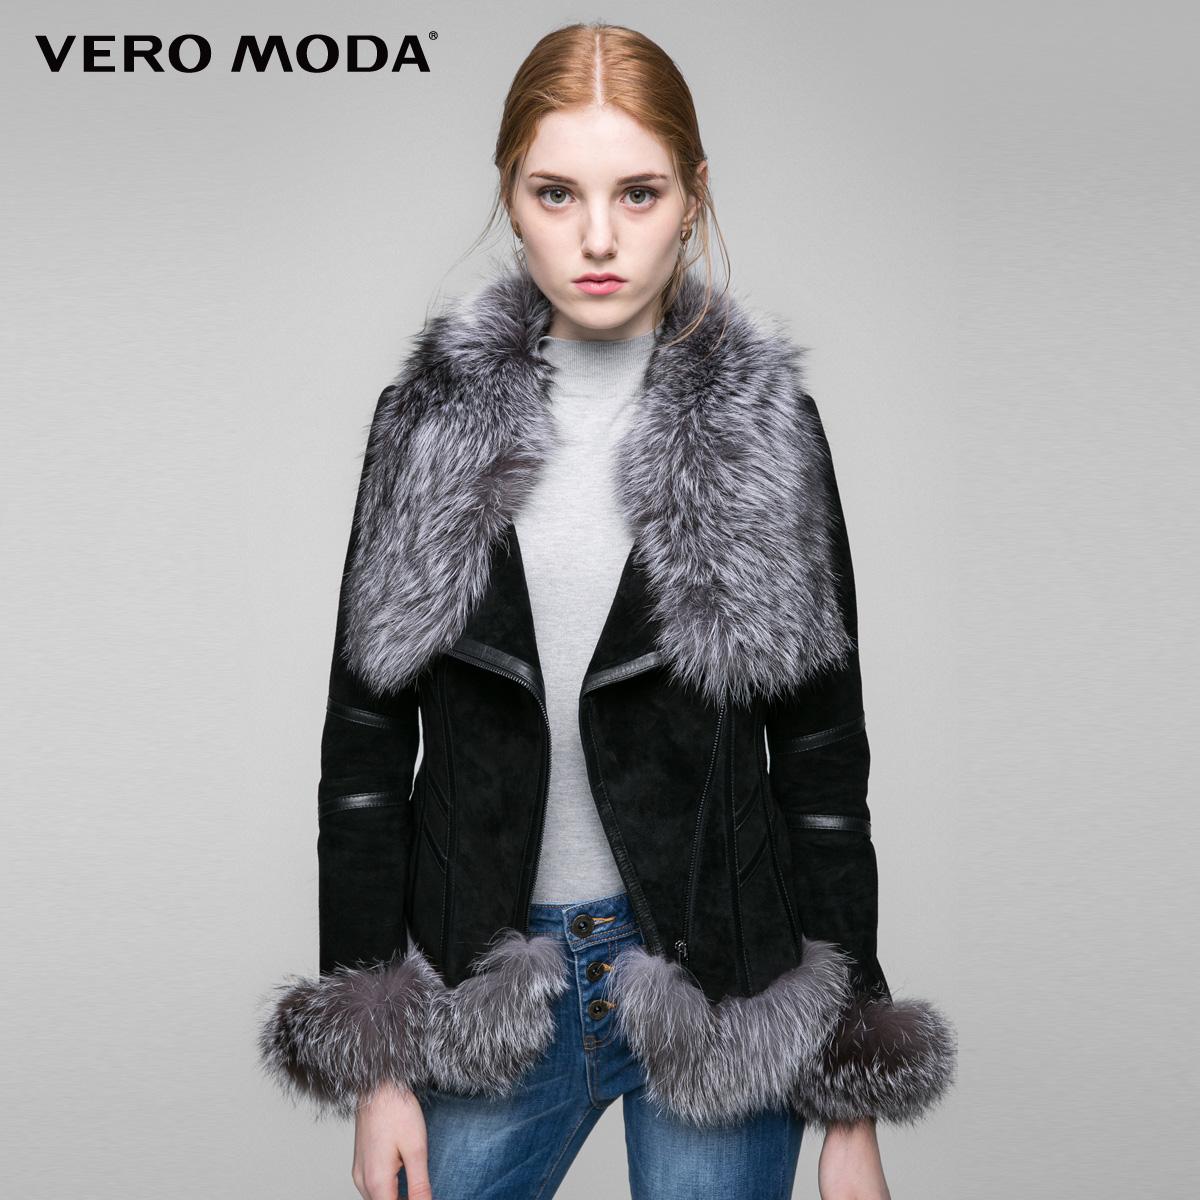 Кожаная куртка VERO MODA 316428526 VeroModa